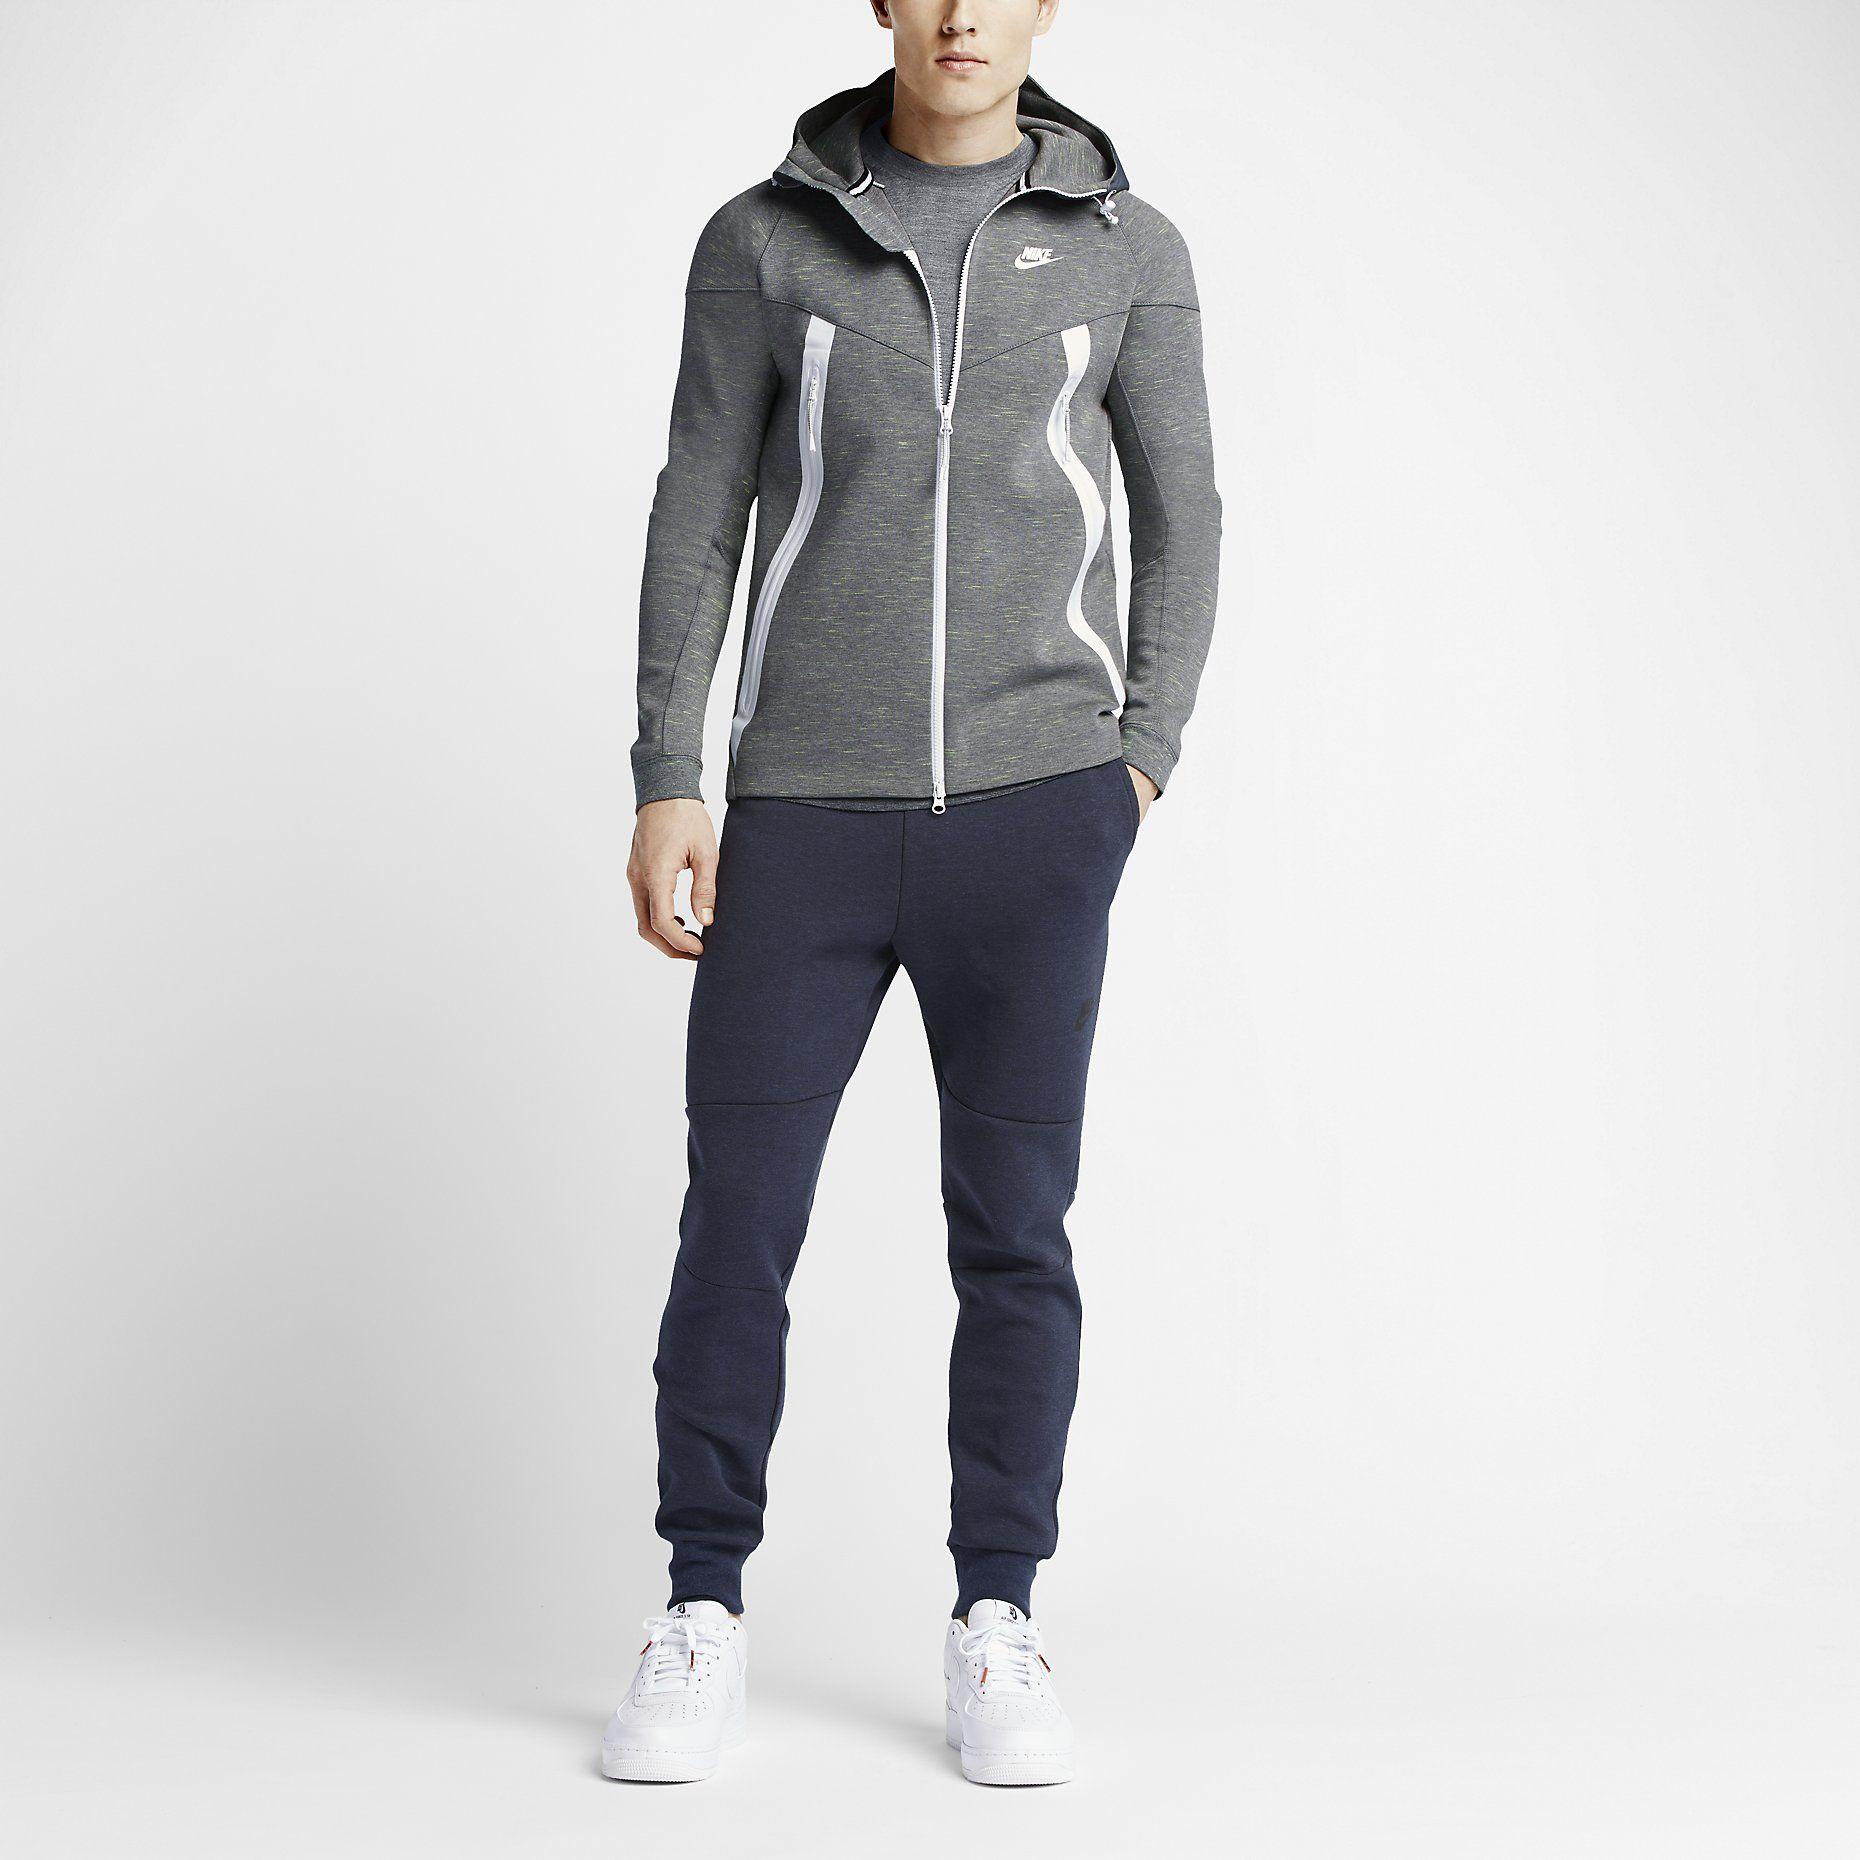 Nike Tech Fleece Windrunner Super Men's Jacket. Nike Store